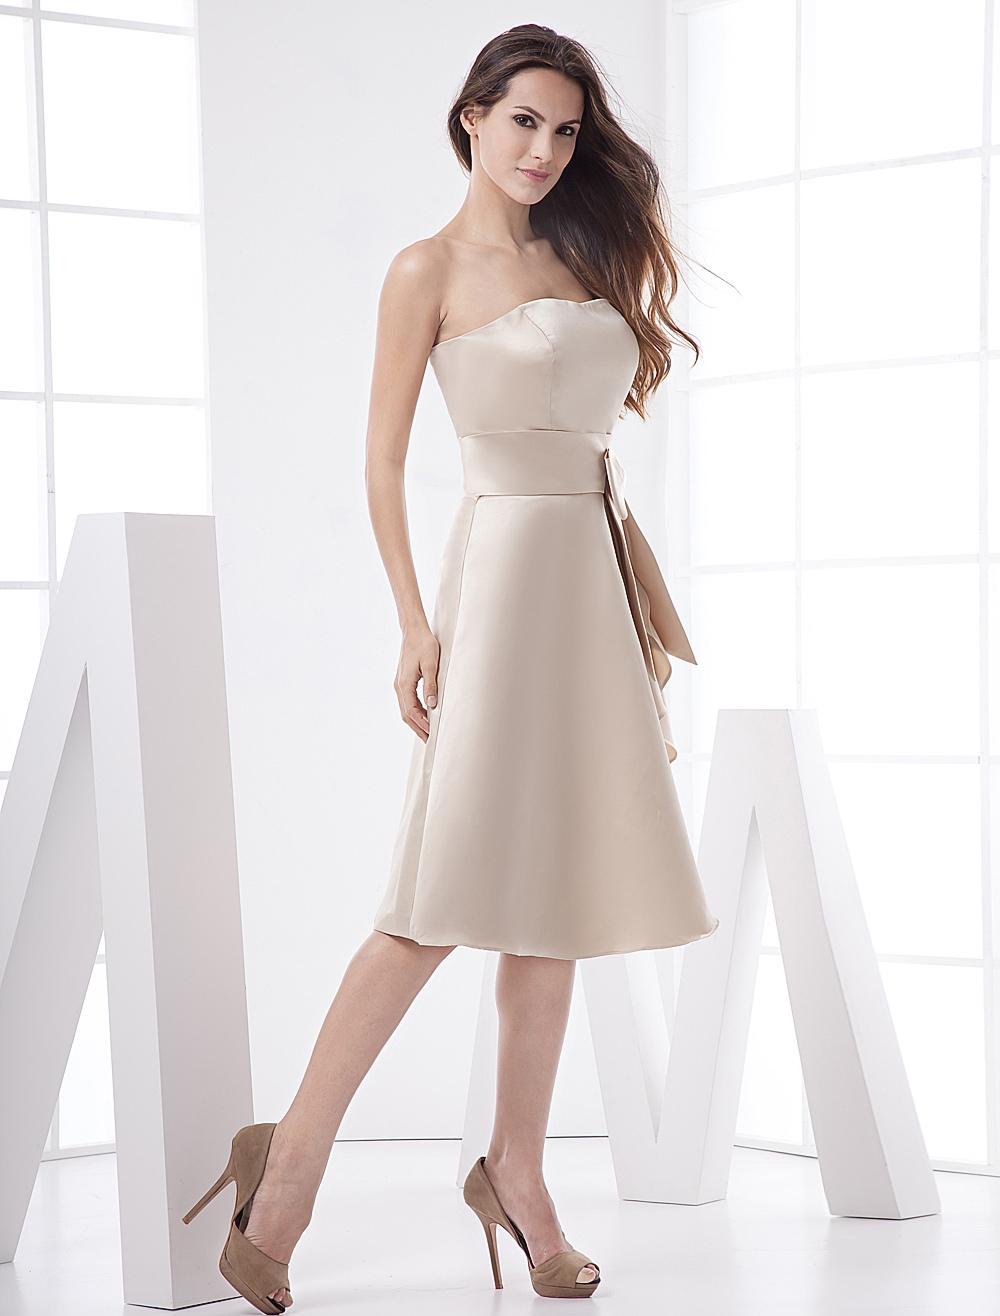 Strapless dress prom